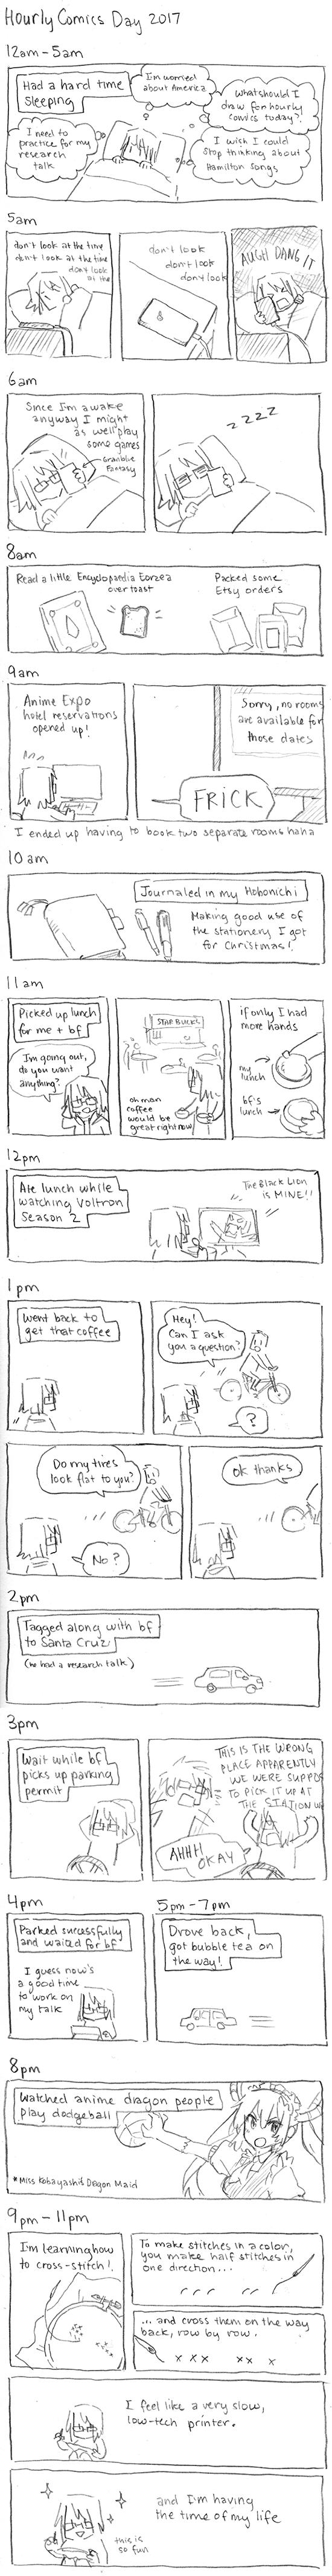 Hourly Comics Day 2017